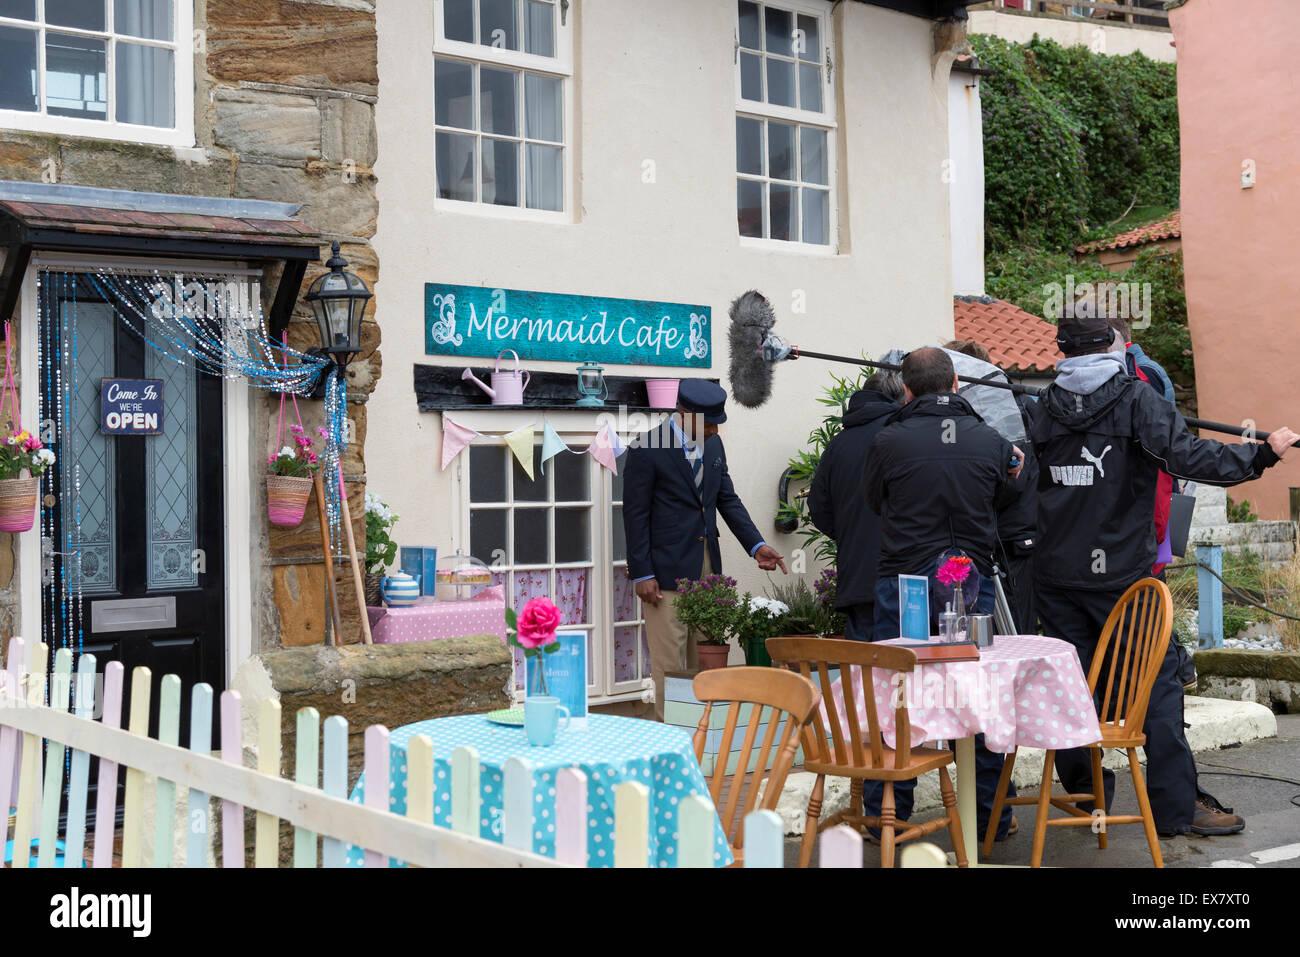 Film crew recording children's TV program starring Bernard Cribbins in the North Yorkshire village of Staithes - Stock Image